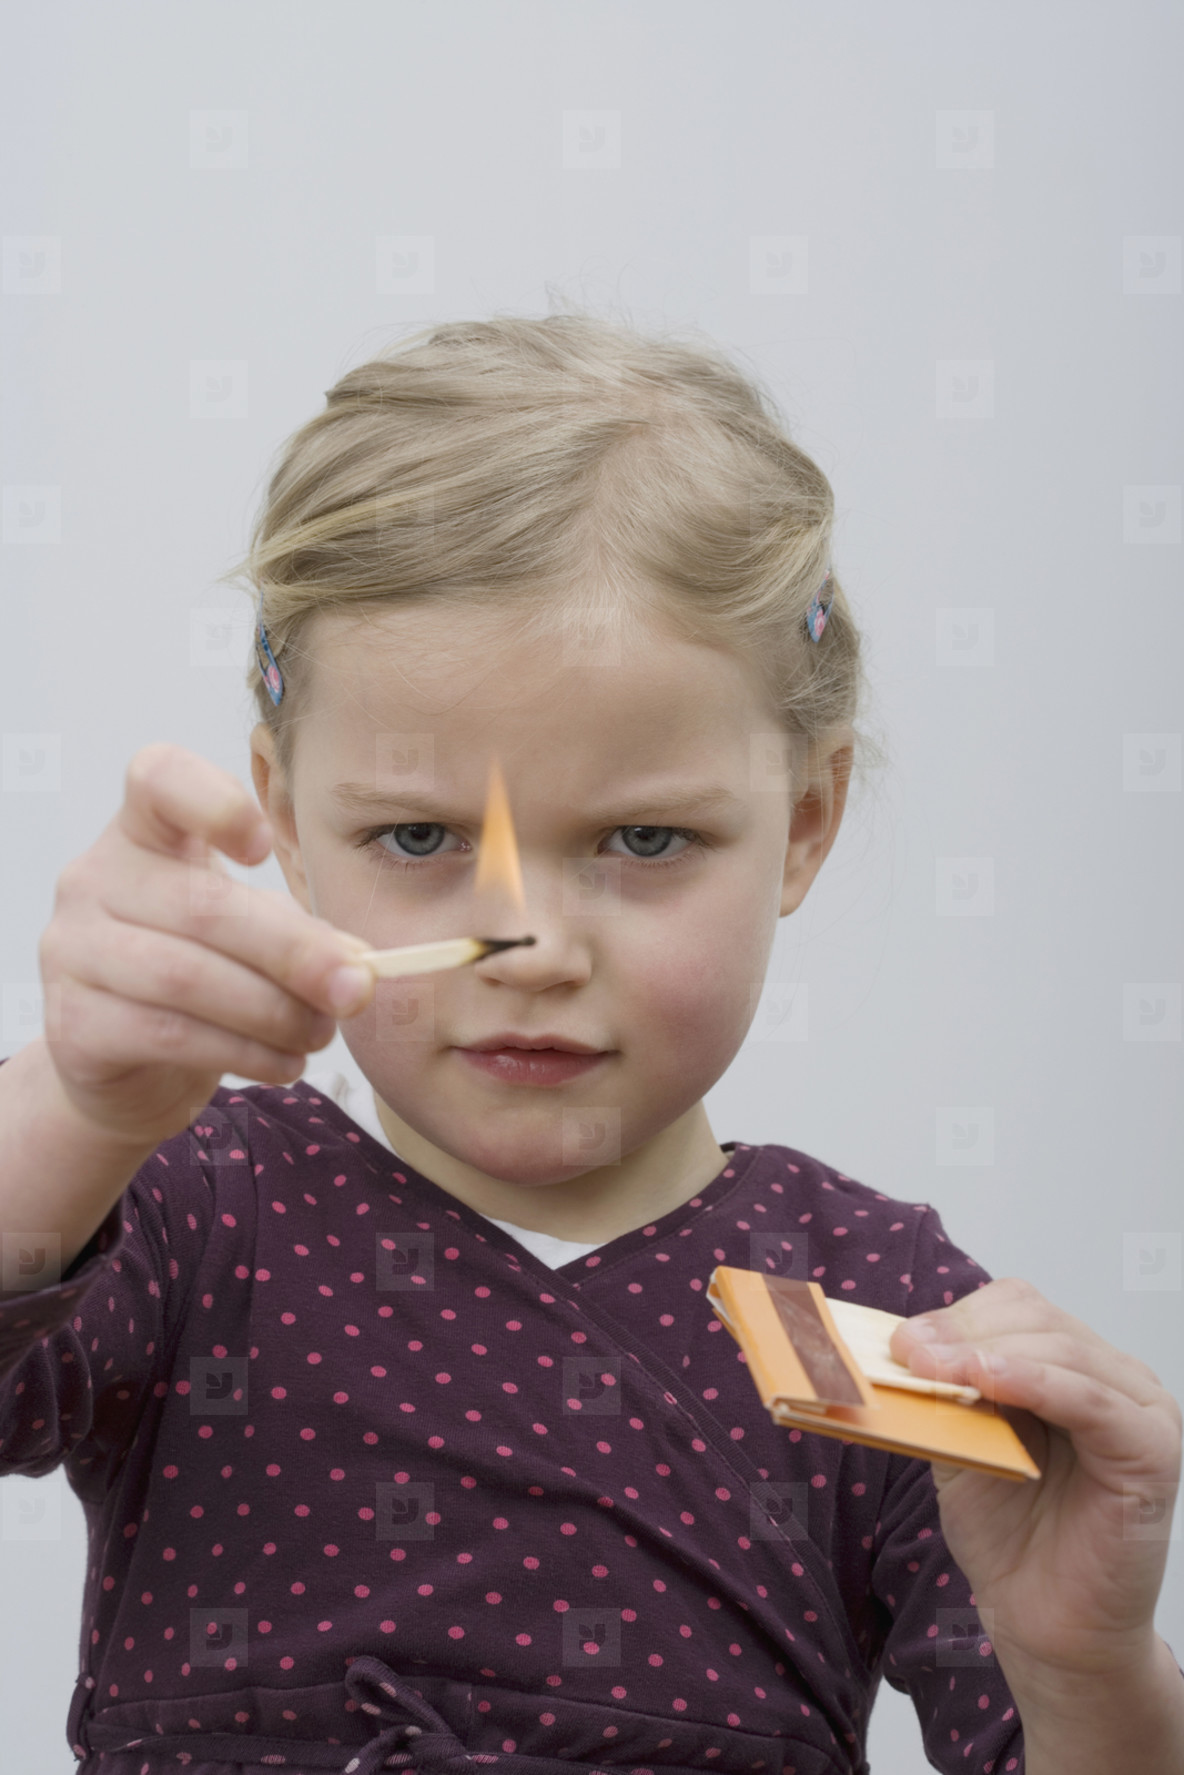 Ребенок играет со спичками фото